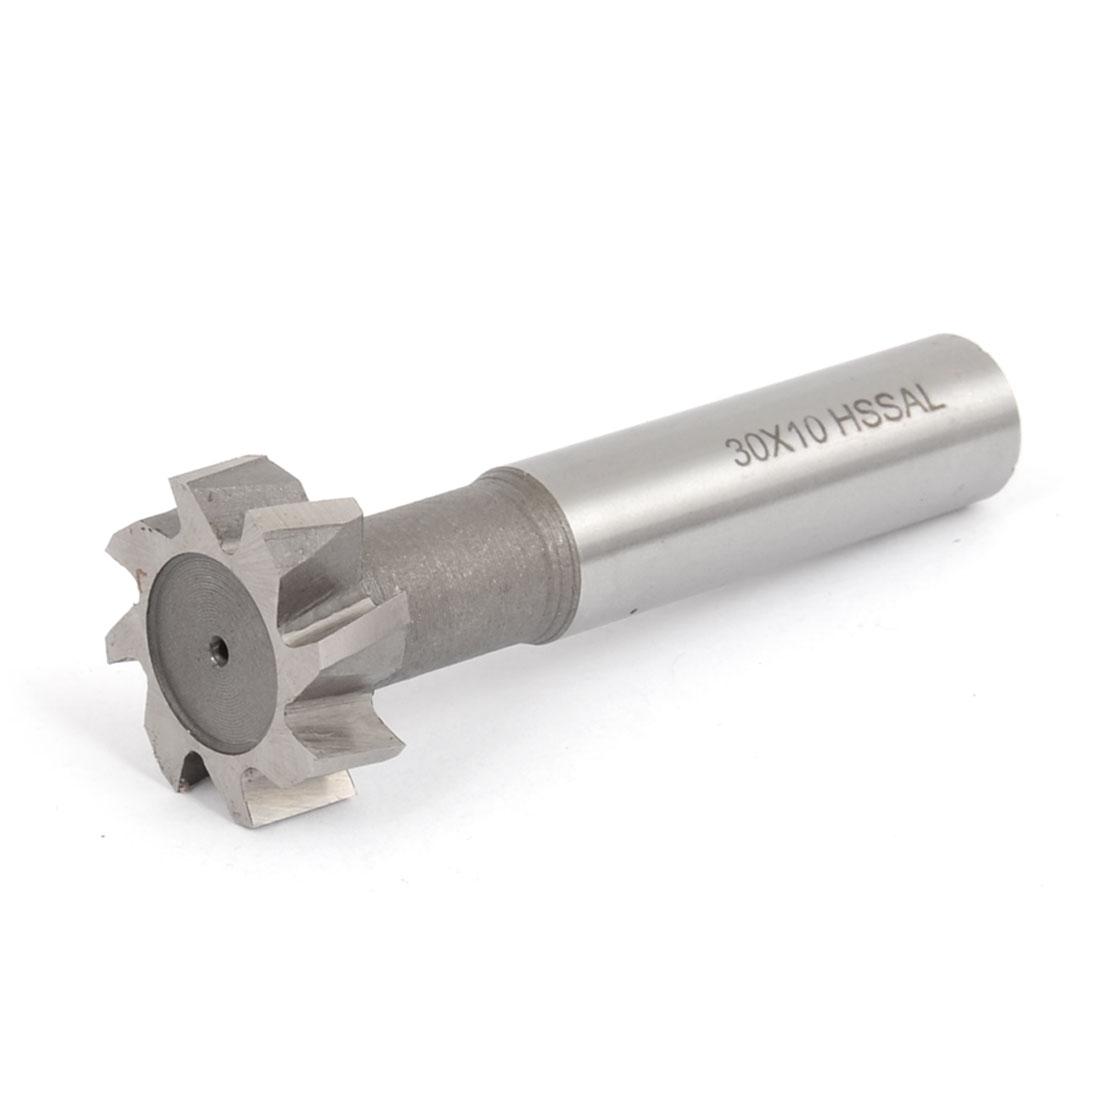 30mm Cutting Dia 10mm Cutting Depth 8 Flutes Straight Shank T Slot End Mill